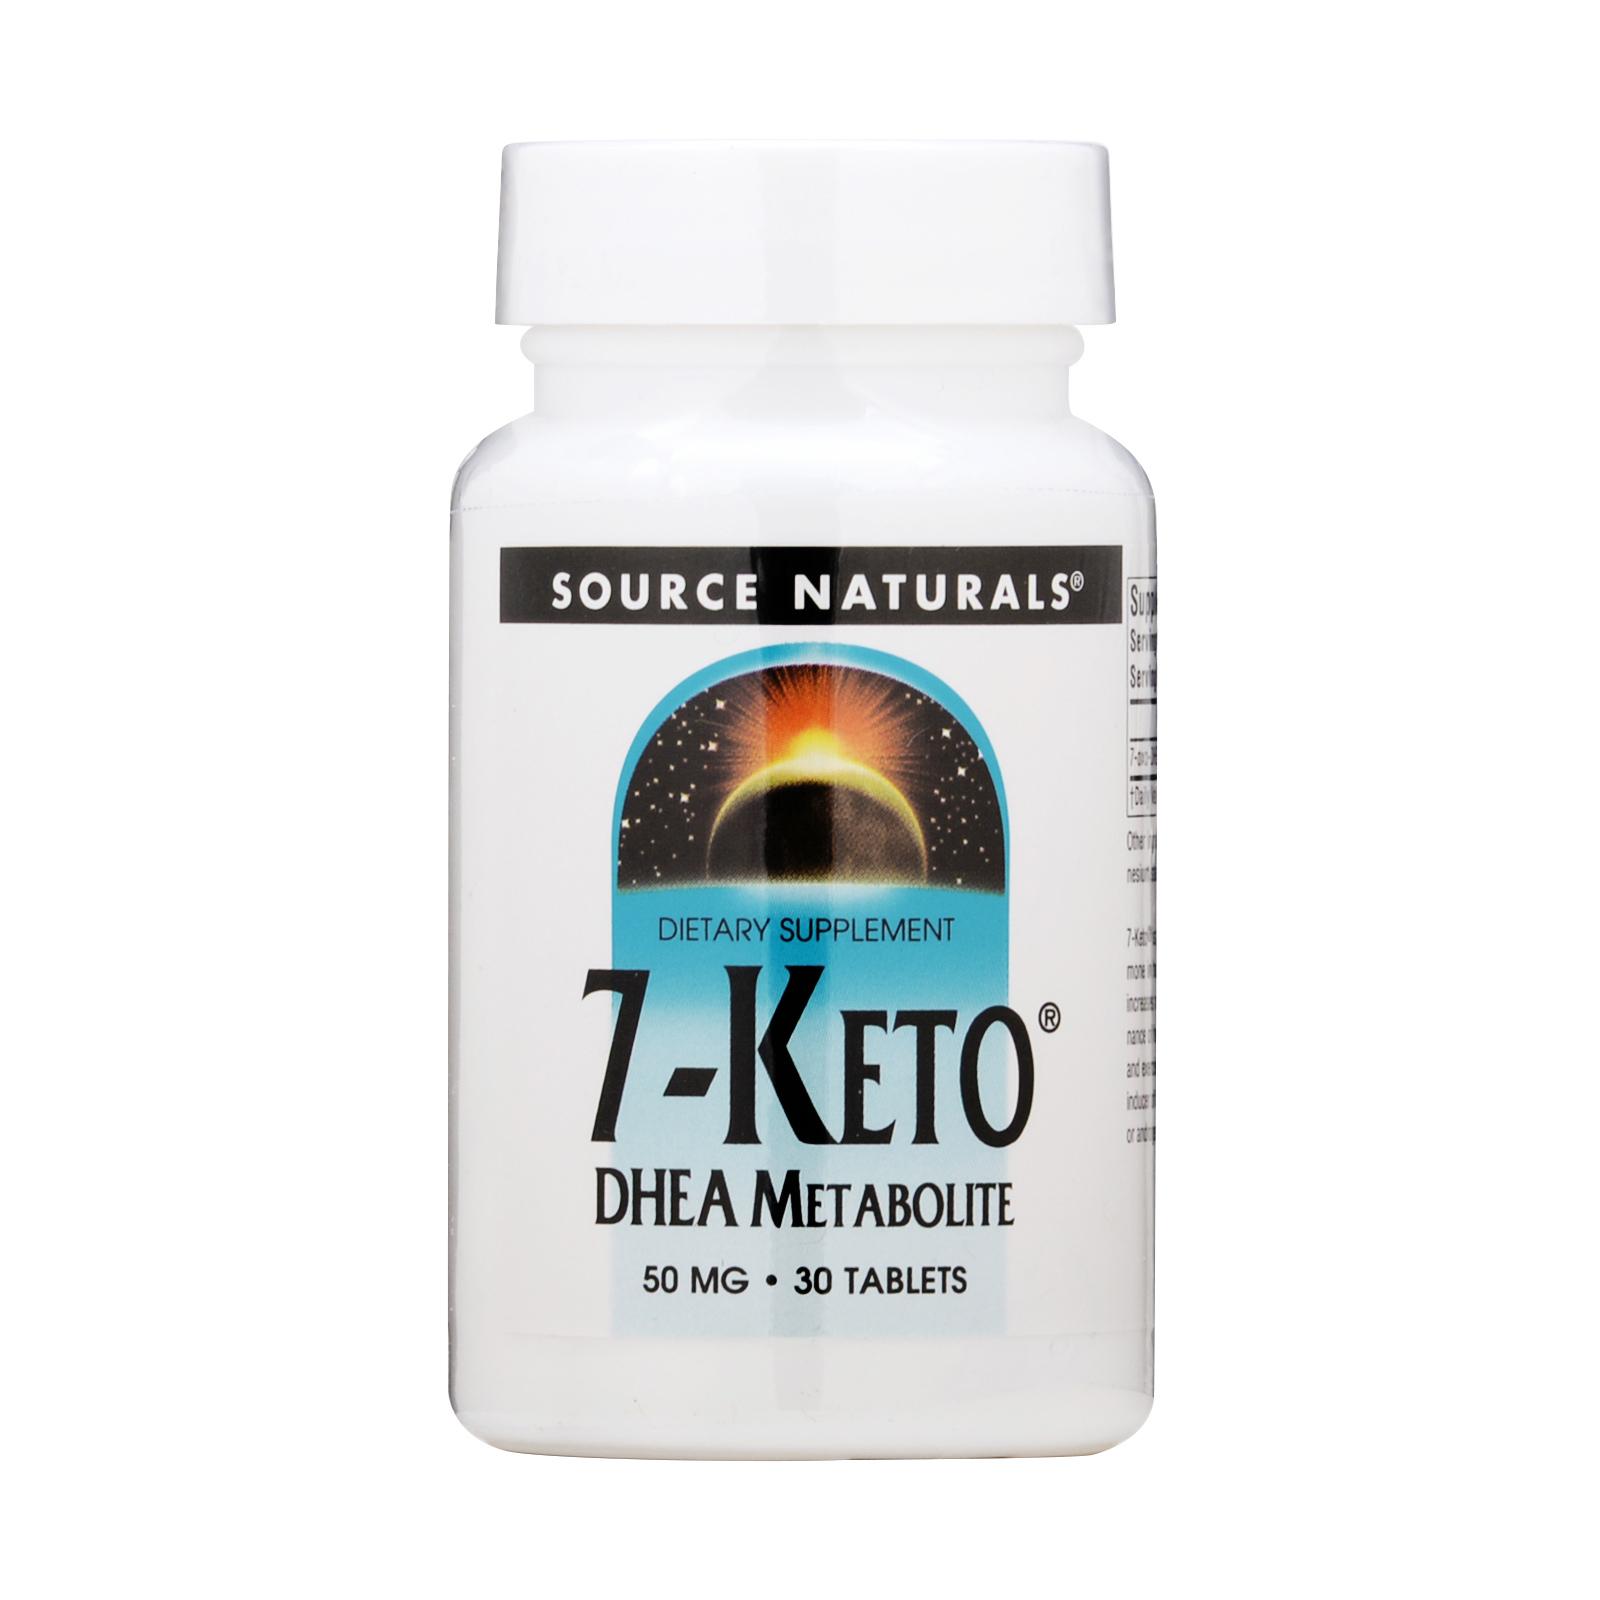 SOURCE NATURALS  7-Keto DHEA Metabolite 30x 50mg,